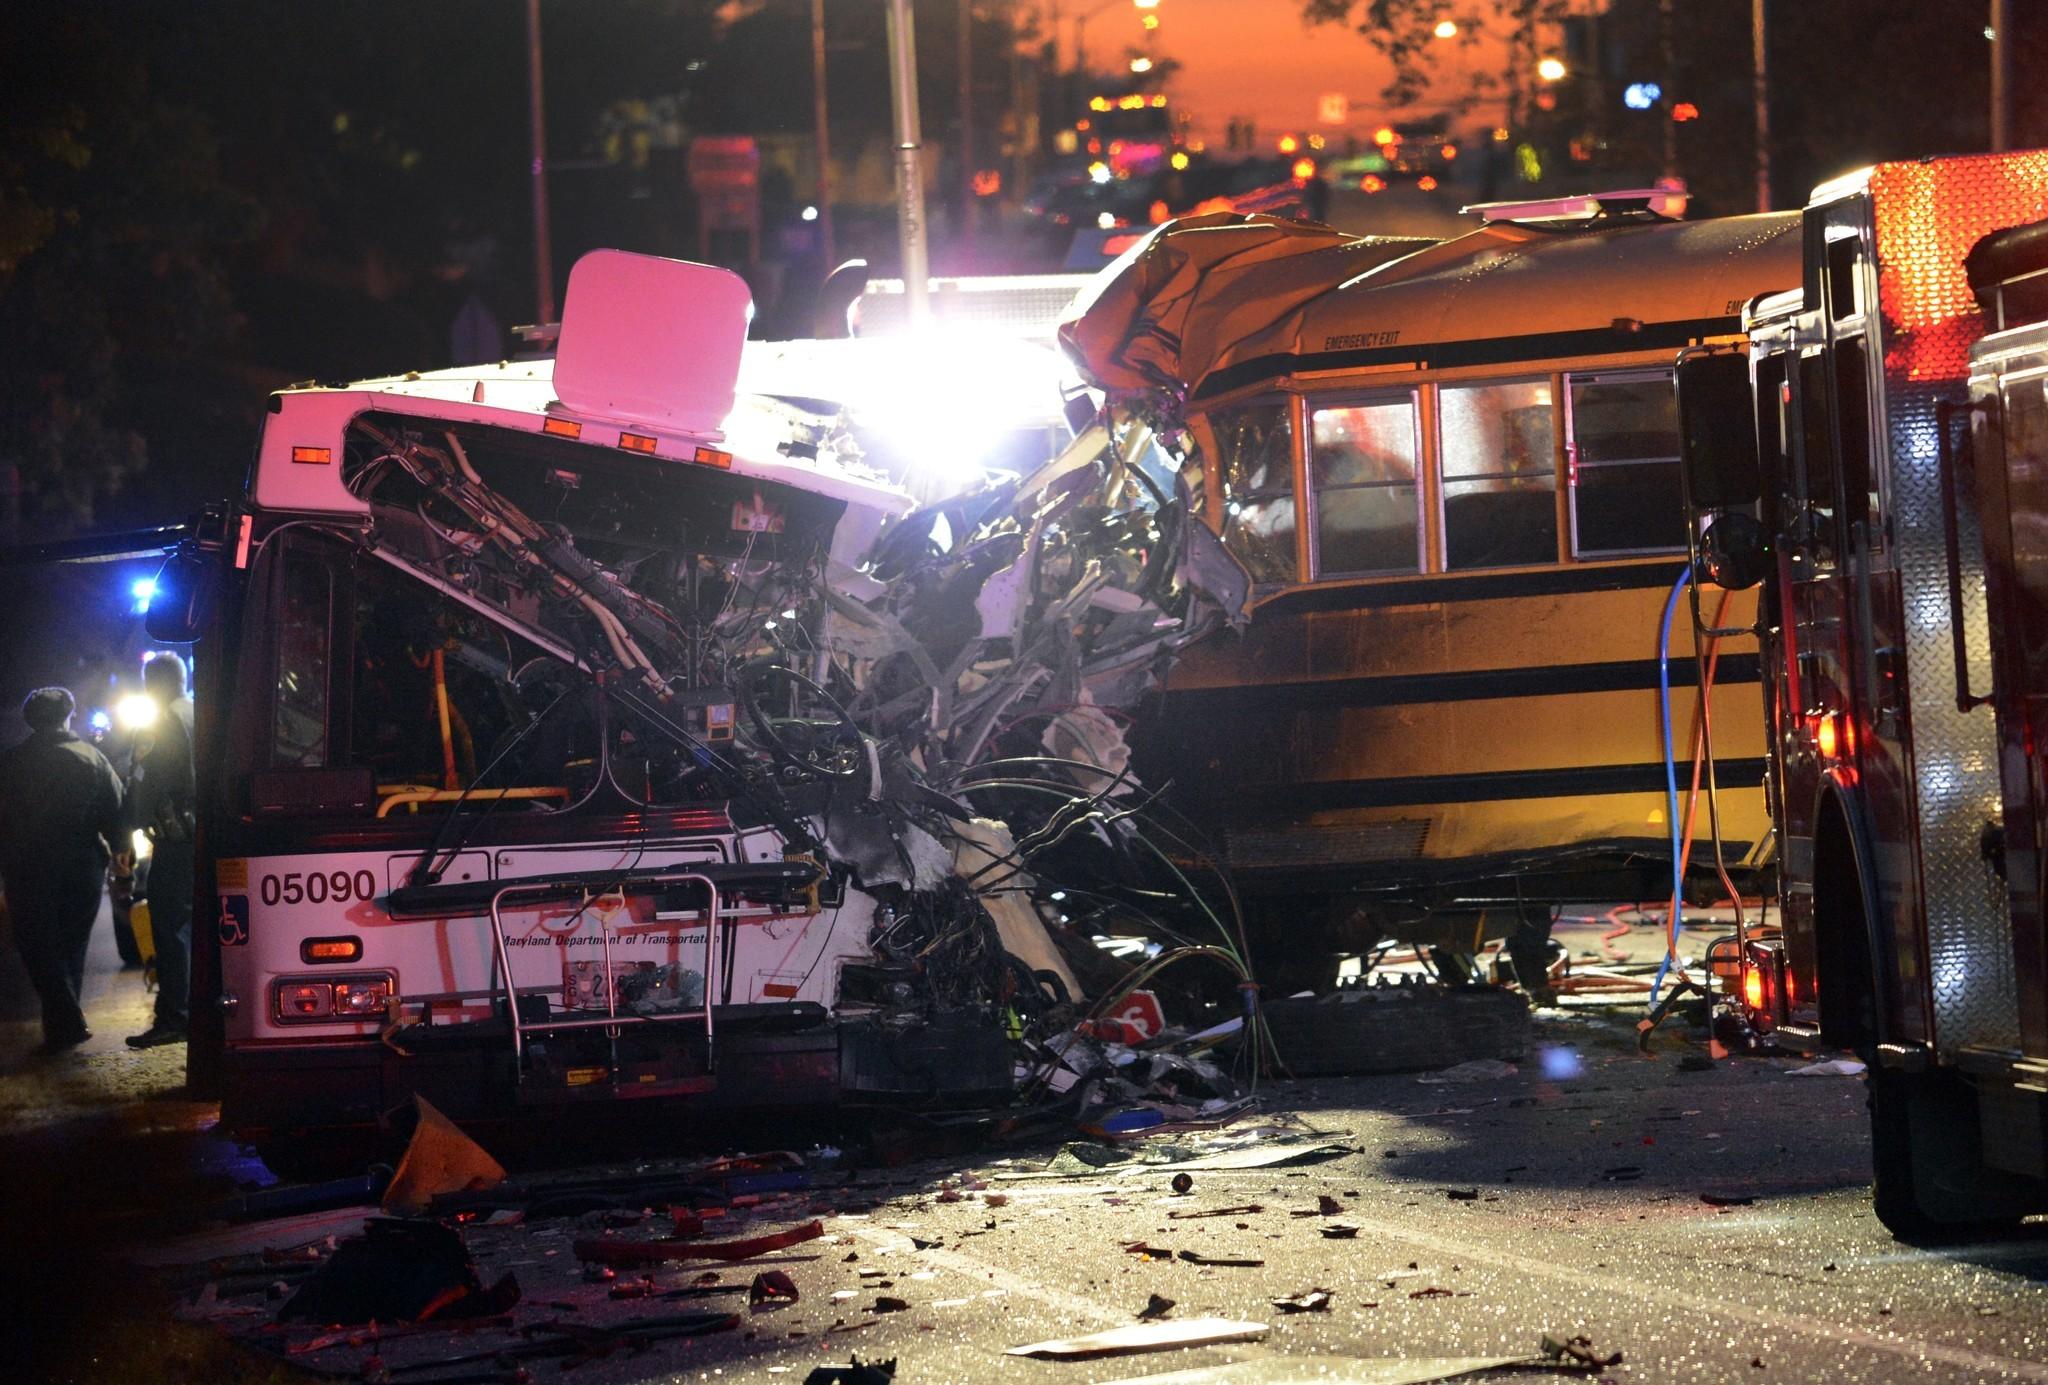 Both bus drivers among 6 killed in 2-bus Baltimore crash - Chicago ...